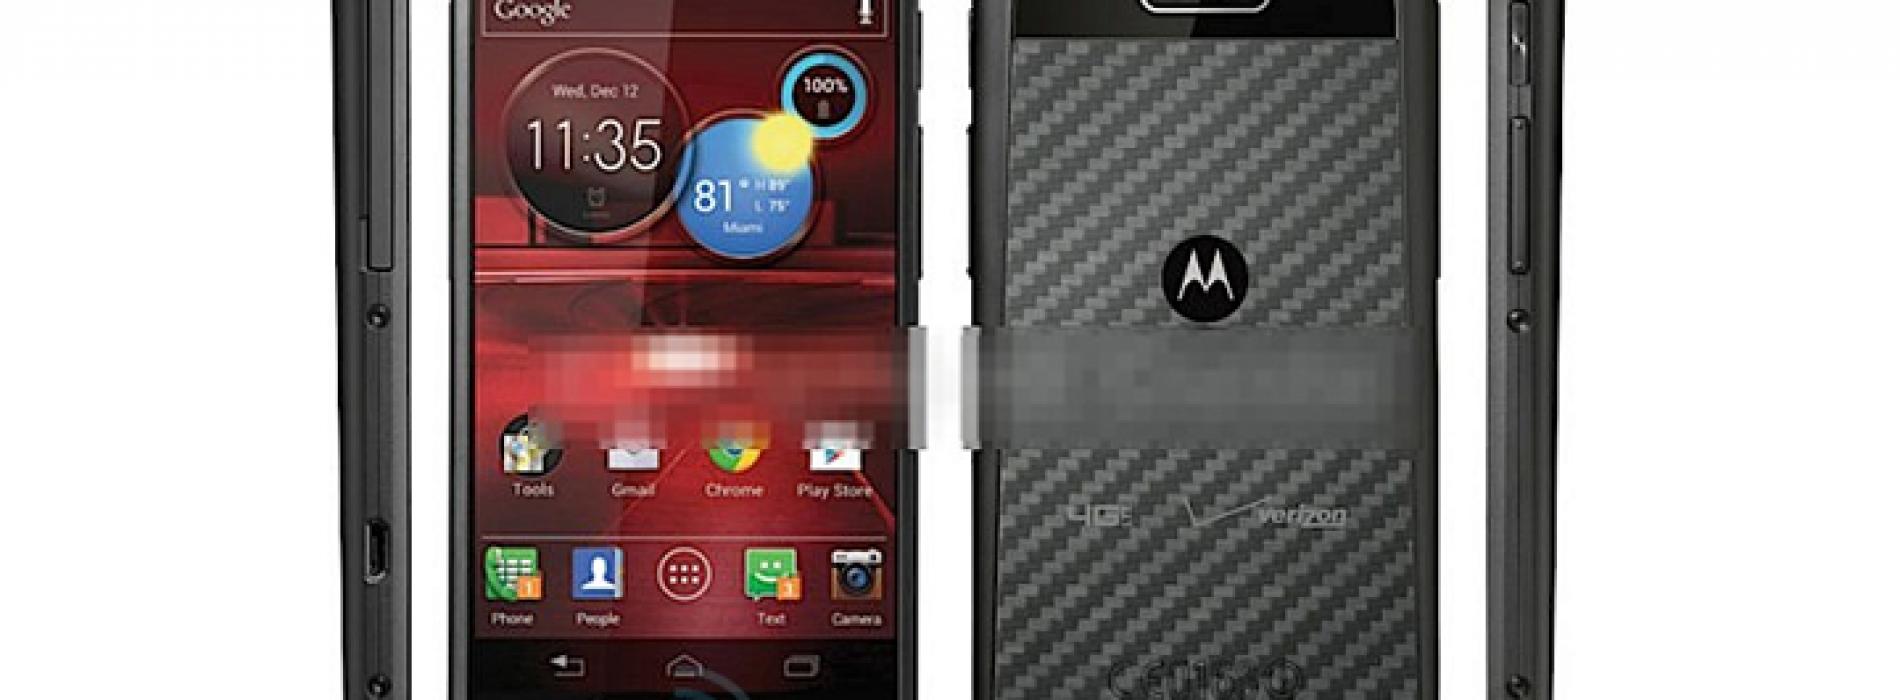 Verizon and Motorola to announce Droid RAZR M 4G LTE